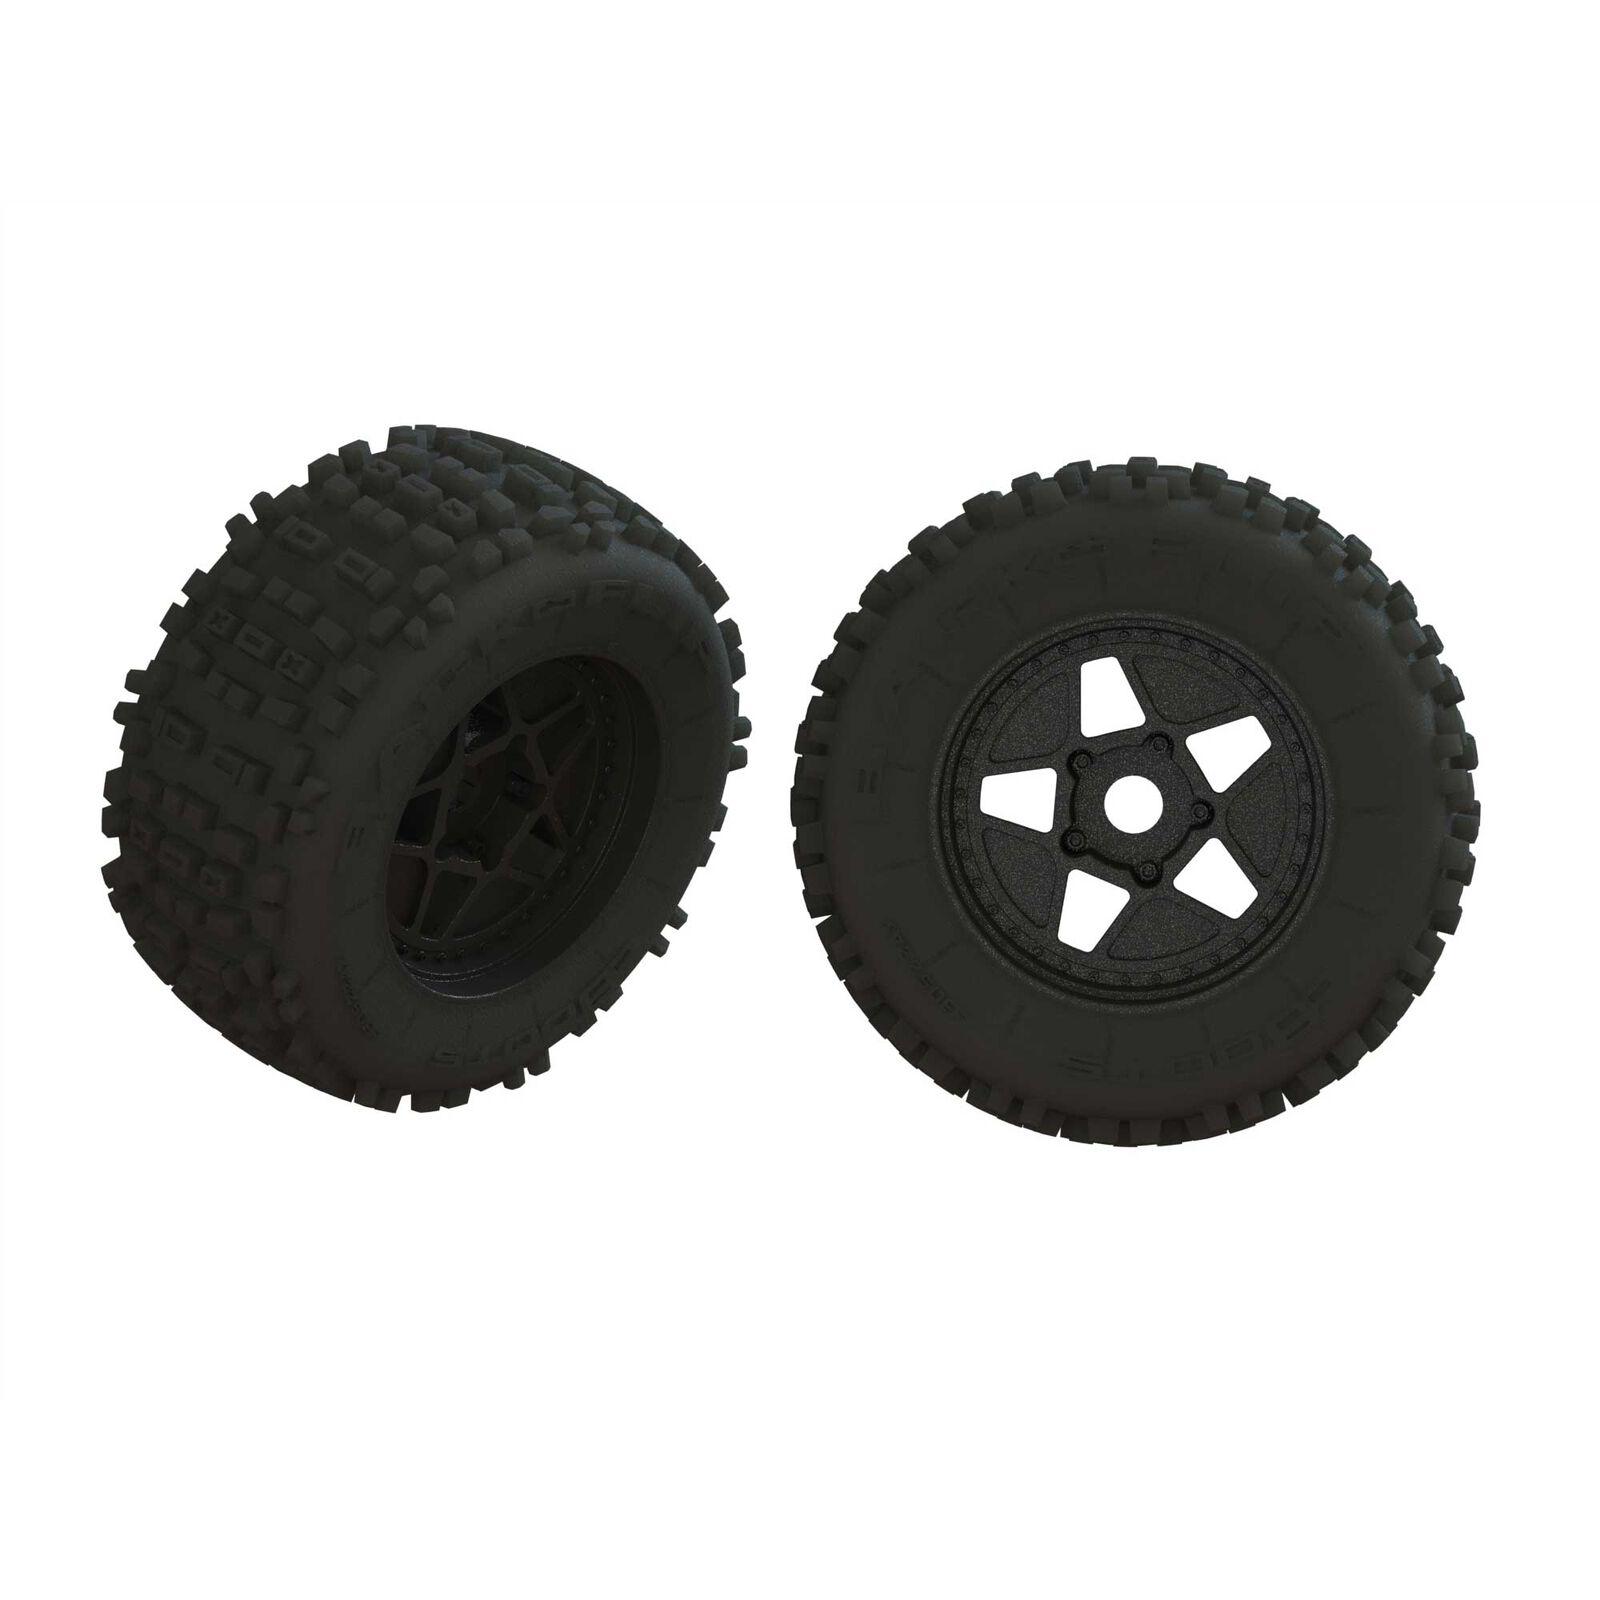 dBoots Backflip Tire Set, Glued (1 pair)